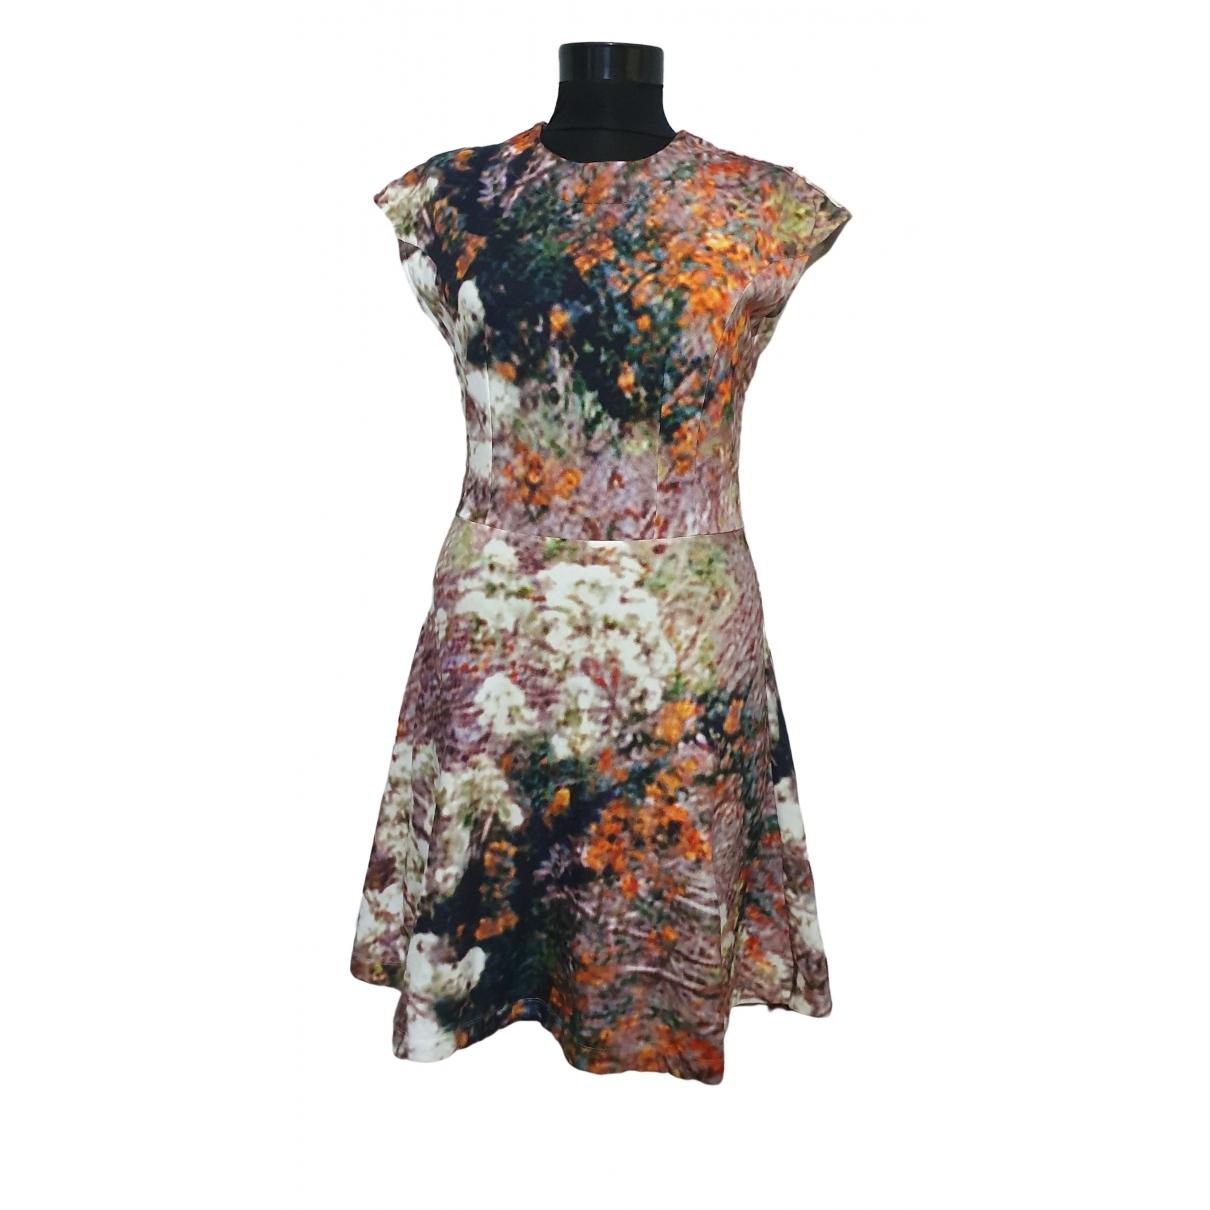 Carven \N Multicolour Cotton dress for Women S International